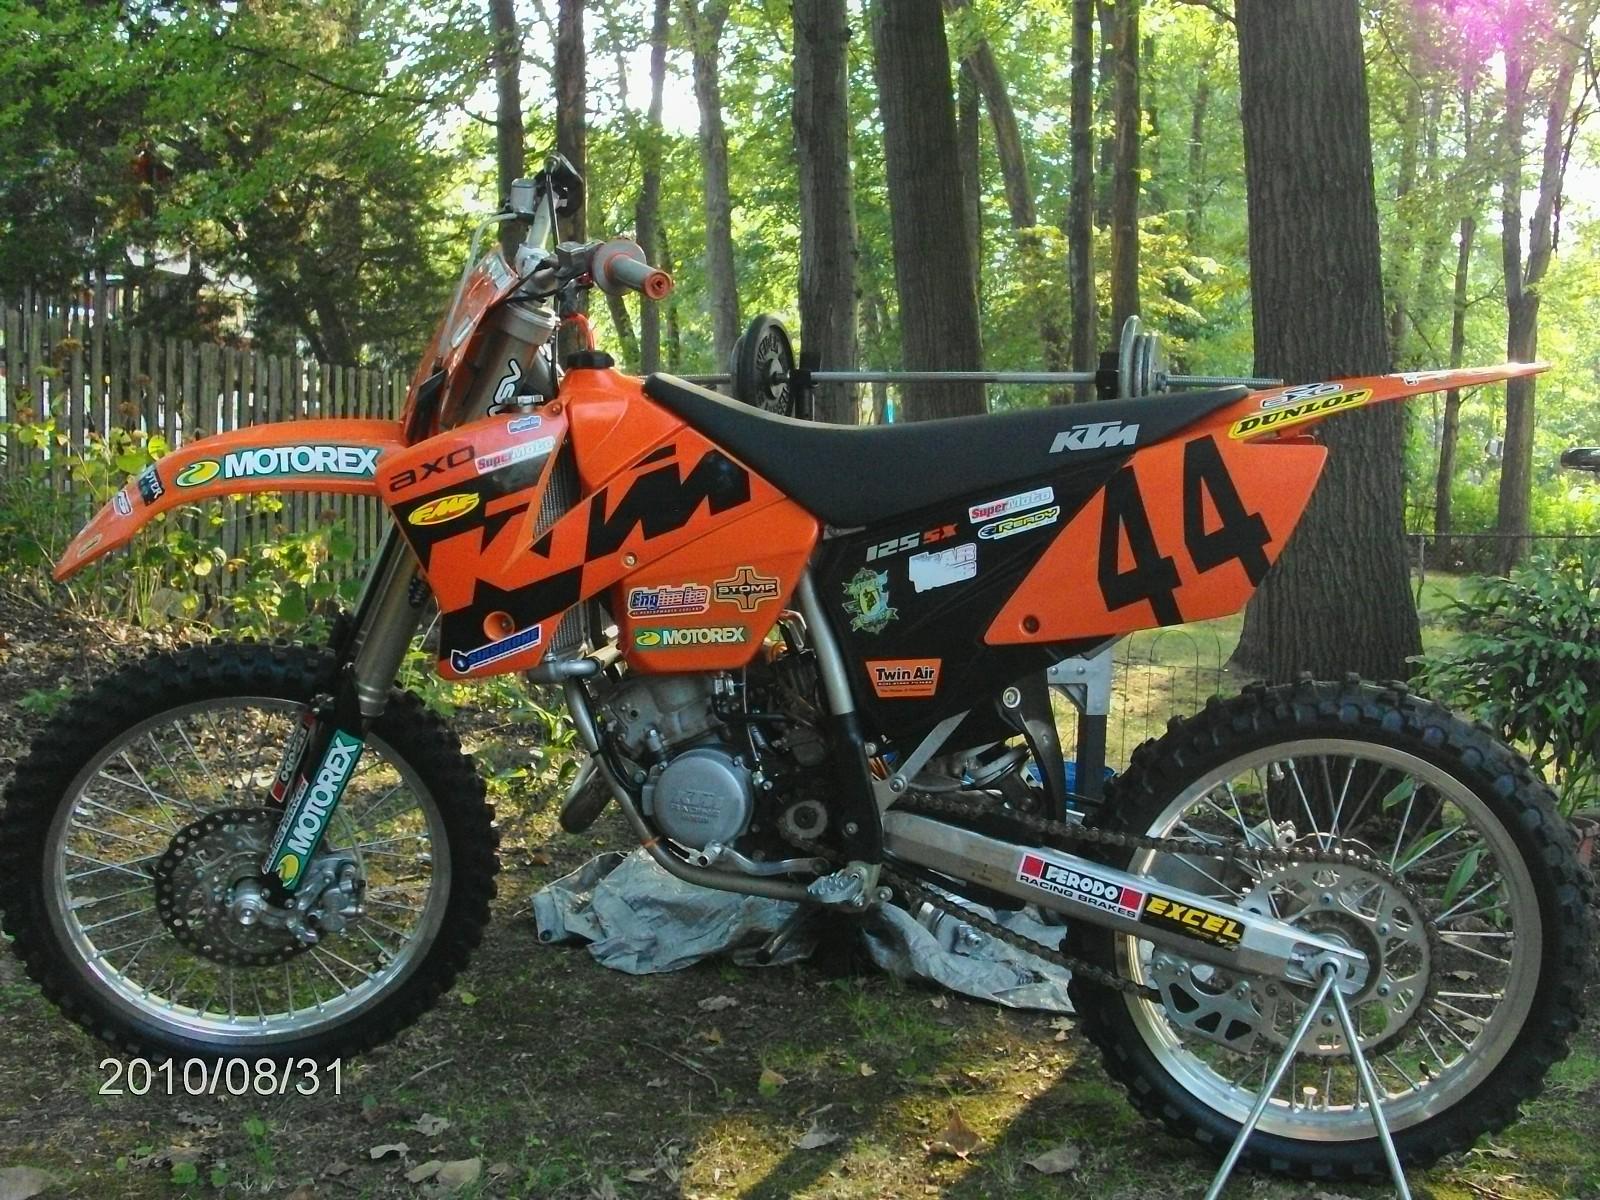 2004 KTM 125SX - racerxusa - Motocross Pictures - Vital MX